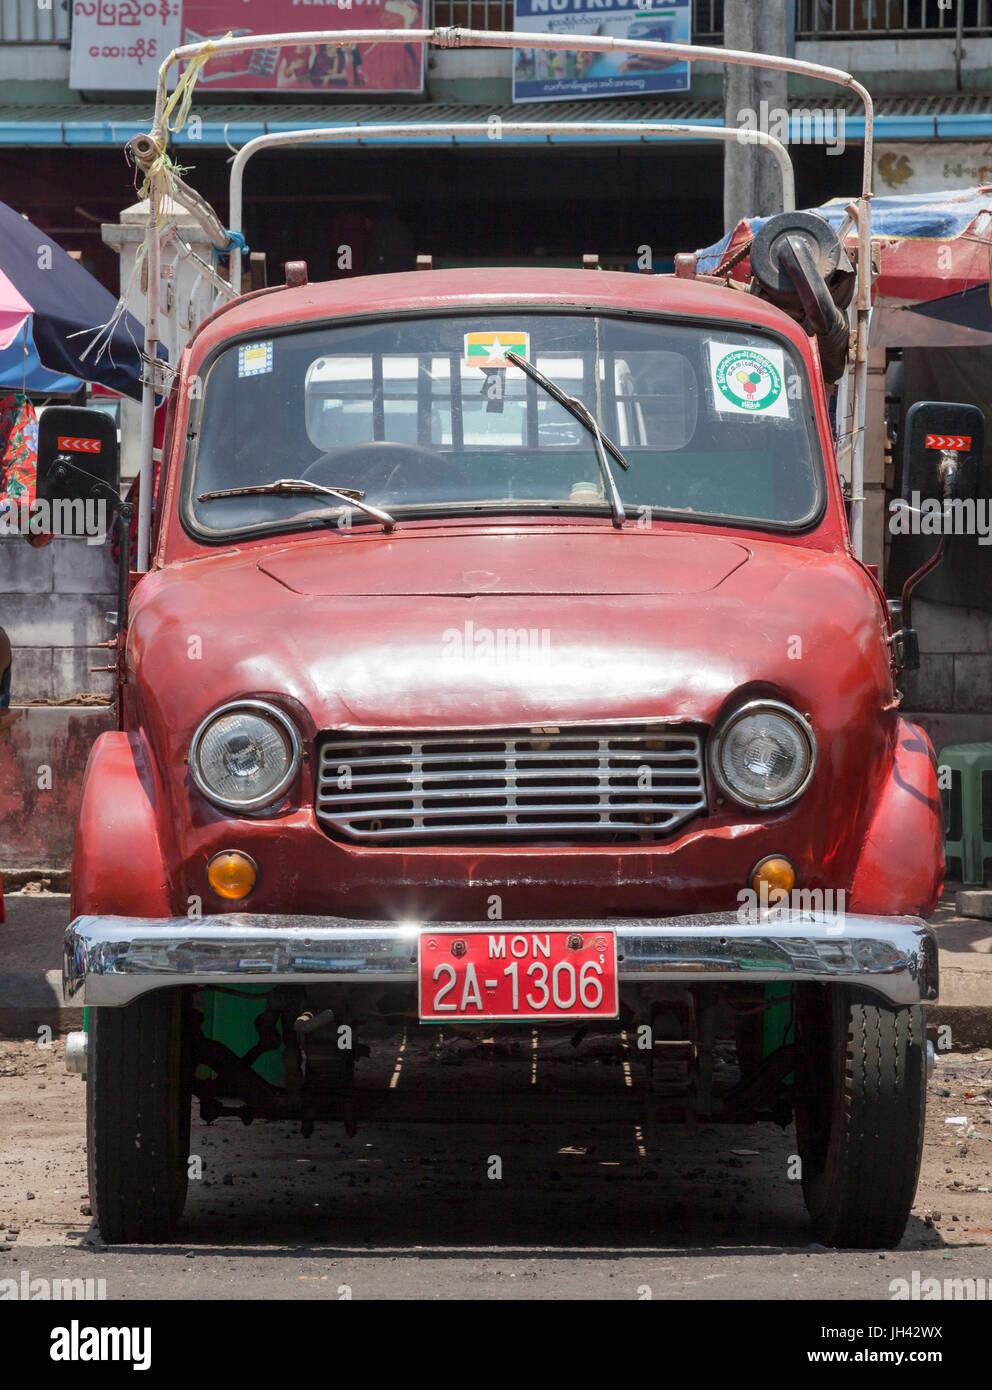 1960s Lorry Stock Photos Images Alamy 19601970 Mercedes Benz Trucks Vintage Mazda D1500 Truck Mawlamyine Myanmar Image